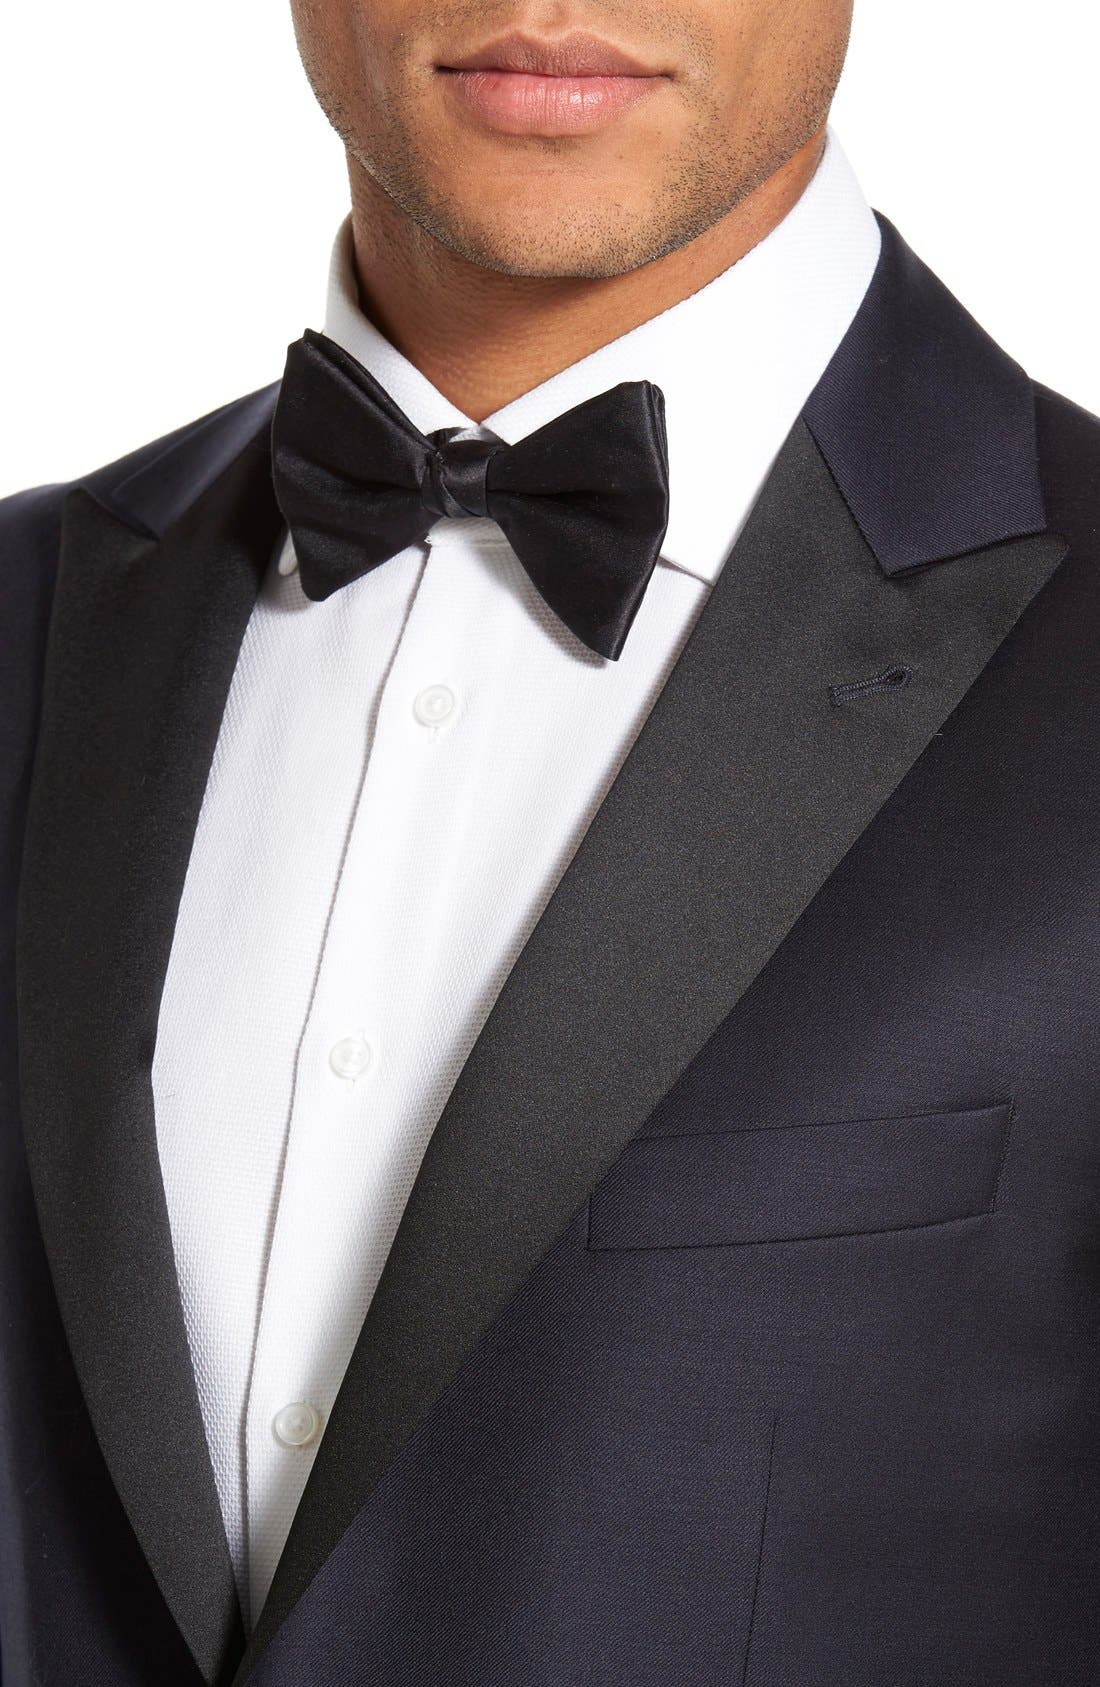 'Aston' Trim Fit Solid Wool Tuxedo,                             Alternate thumbnail 6, color,                             410